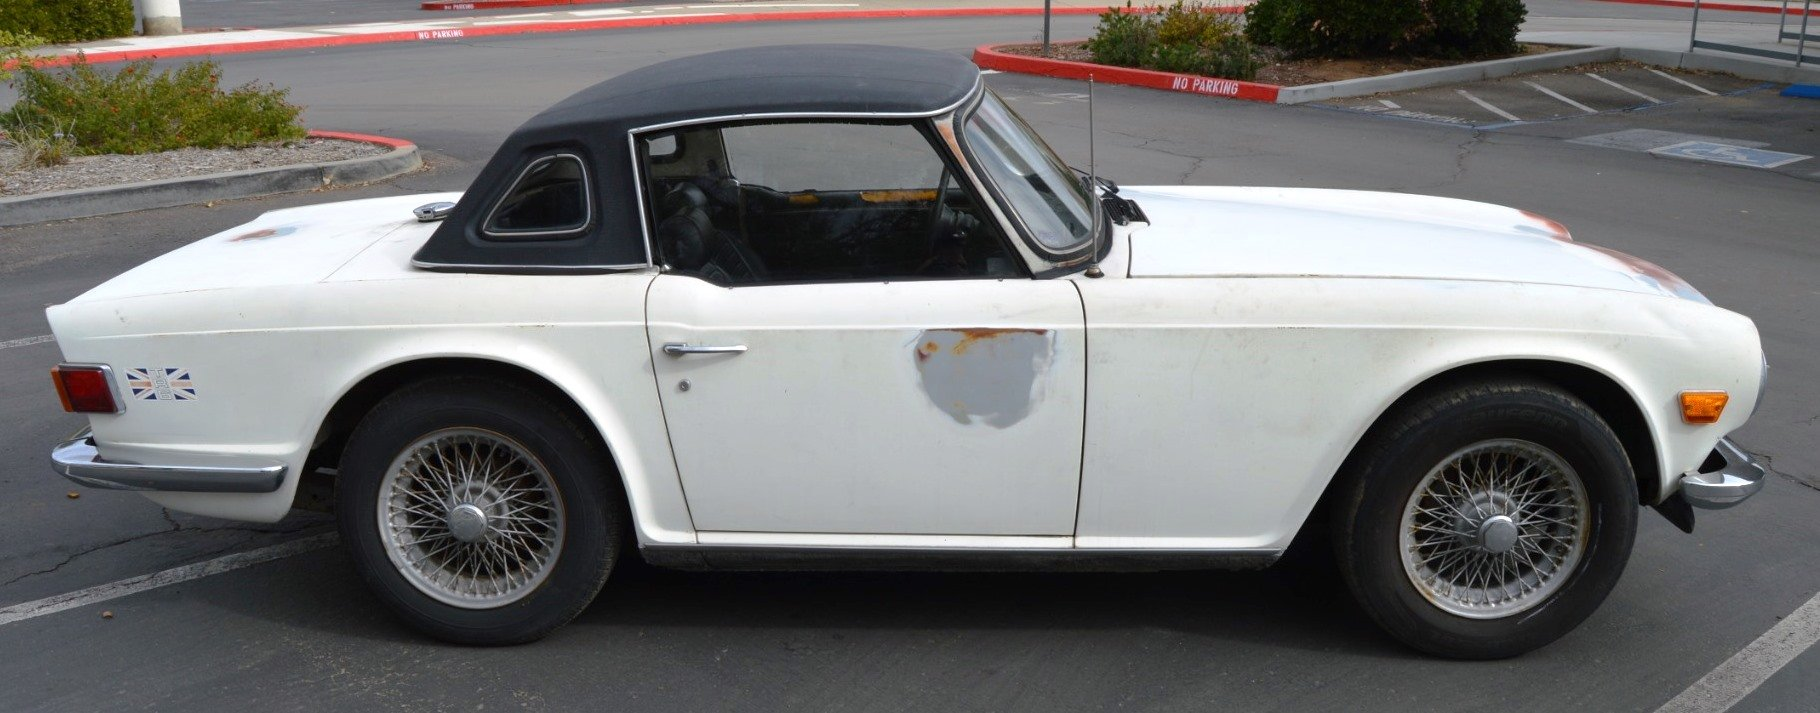 1973 Rust Free Triumph Tr6 White  For Sale (picture 2 of 6)